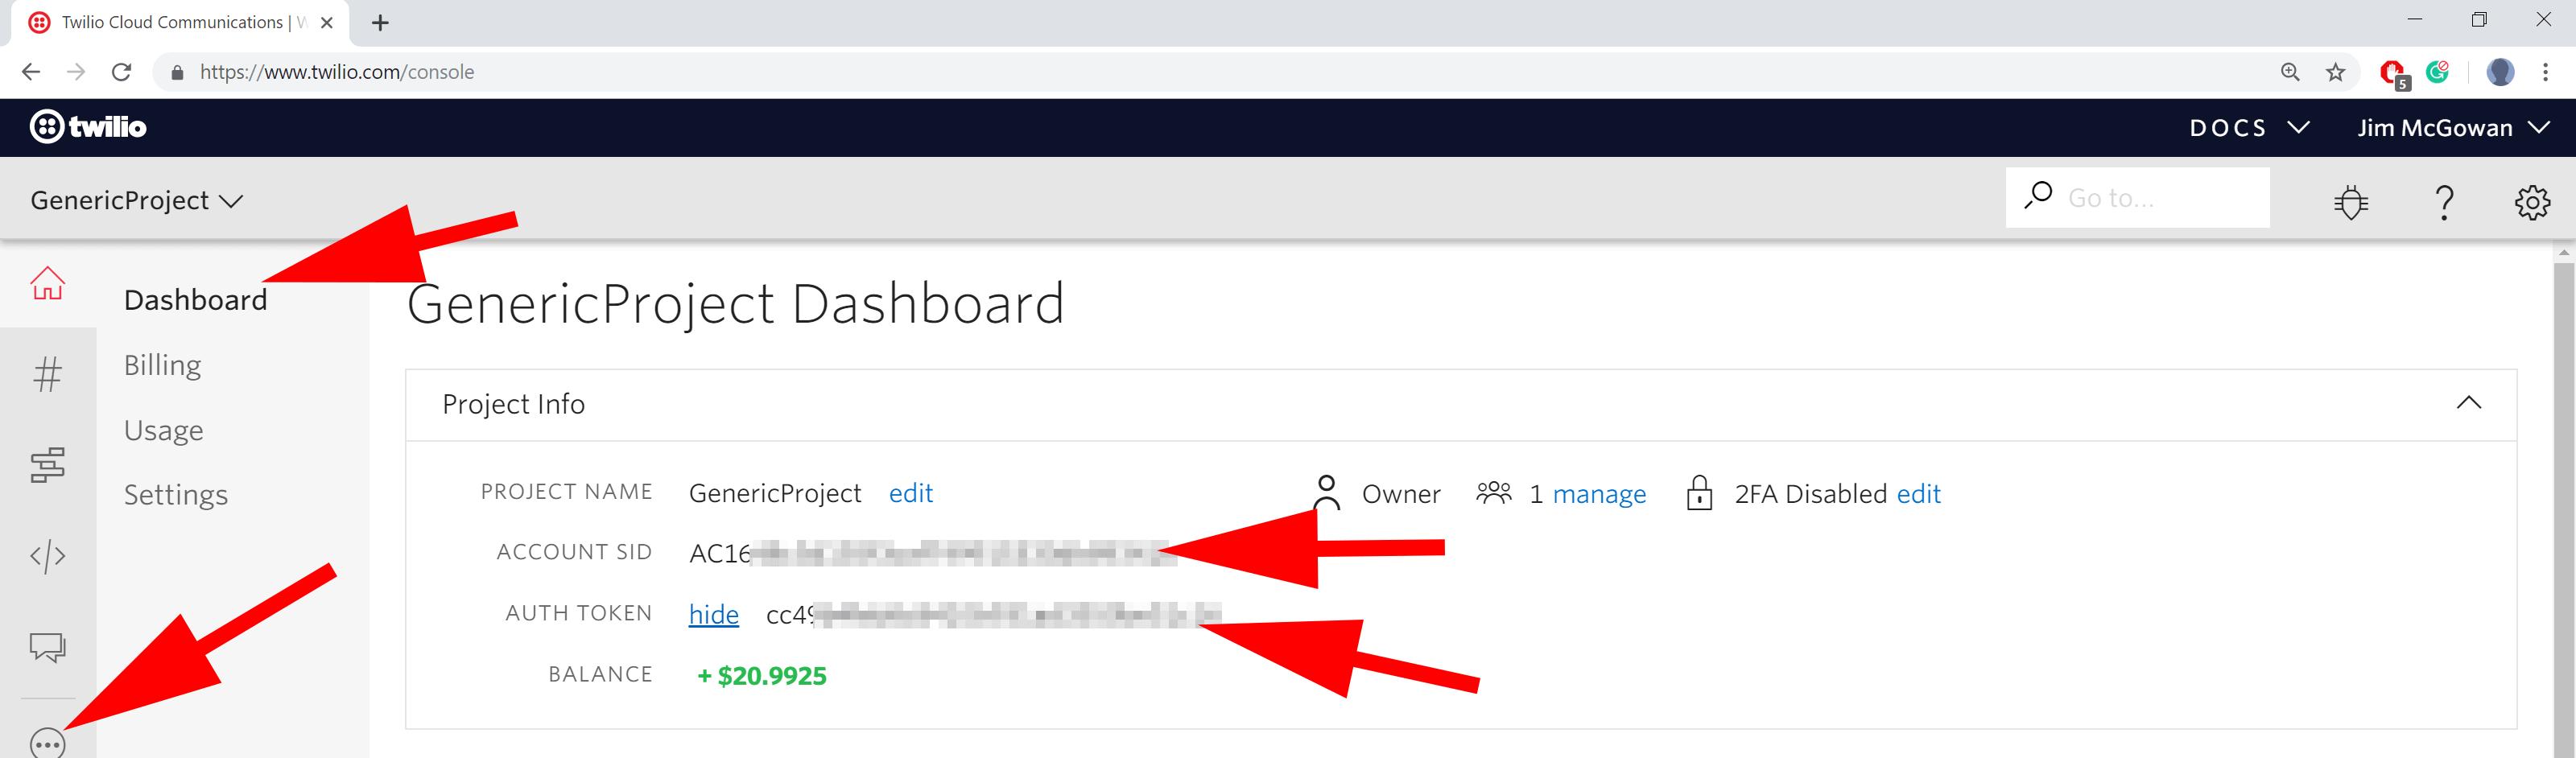 screenshot showing twilio dashboard